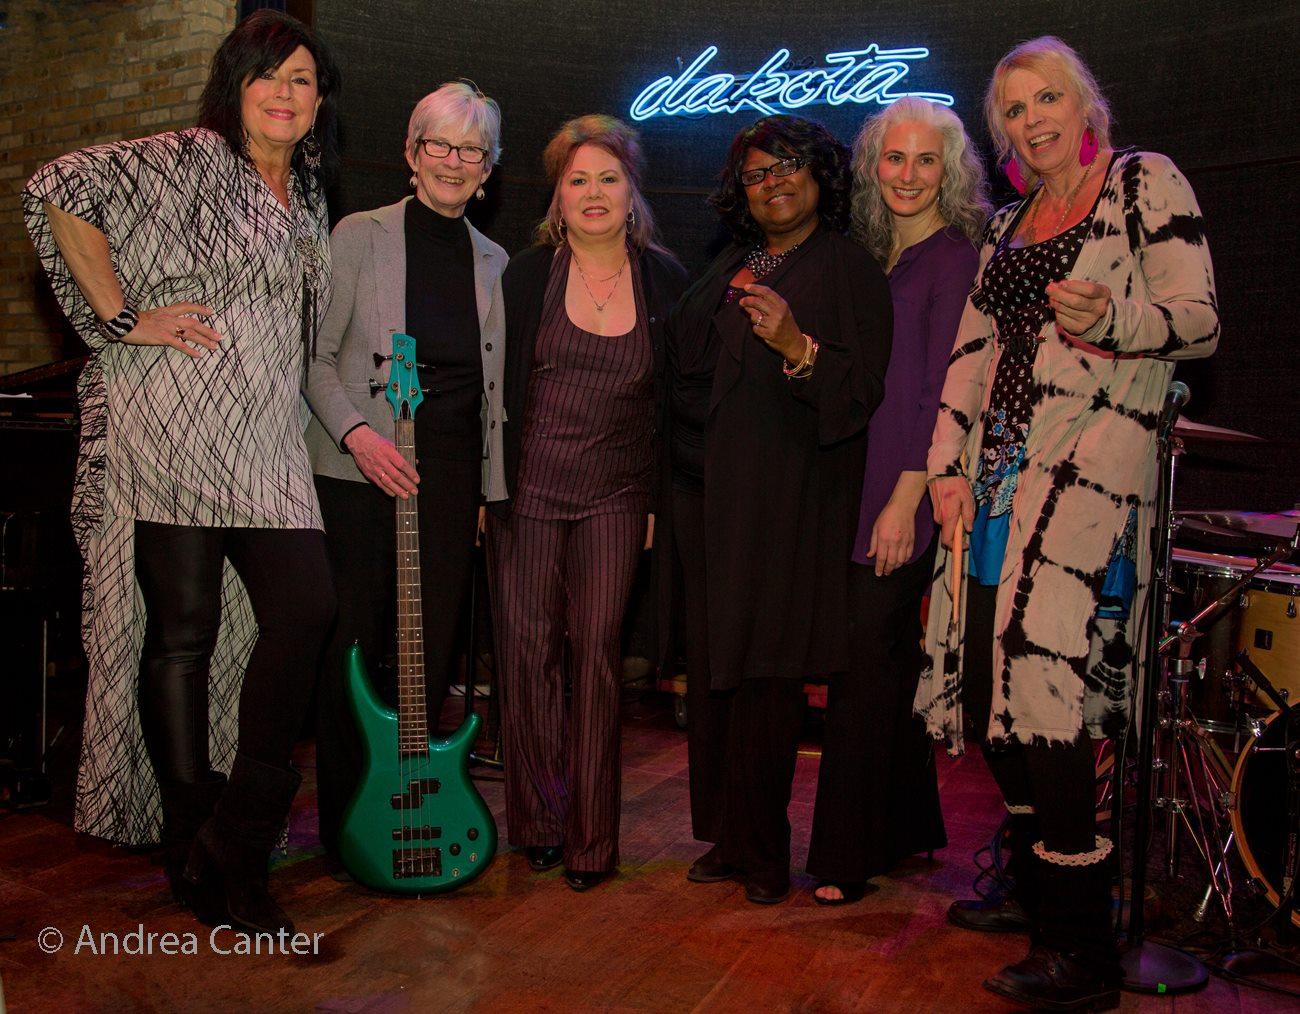 Patty Peterson's Jazz Women All Stars - Patty Peterson (v), Joan Griffith (b), Kathy Jensen (s), Ginger Commodore (v), Mary Louise Knutson (p), and Jendeen Forberg (d), Dakota Jazz Club, Minneapolis, MN.